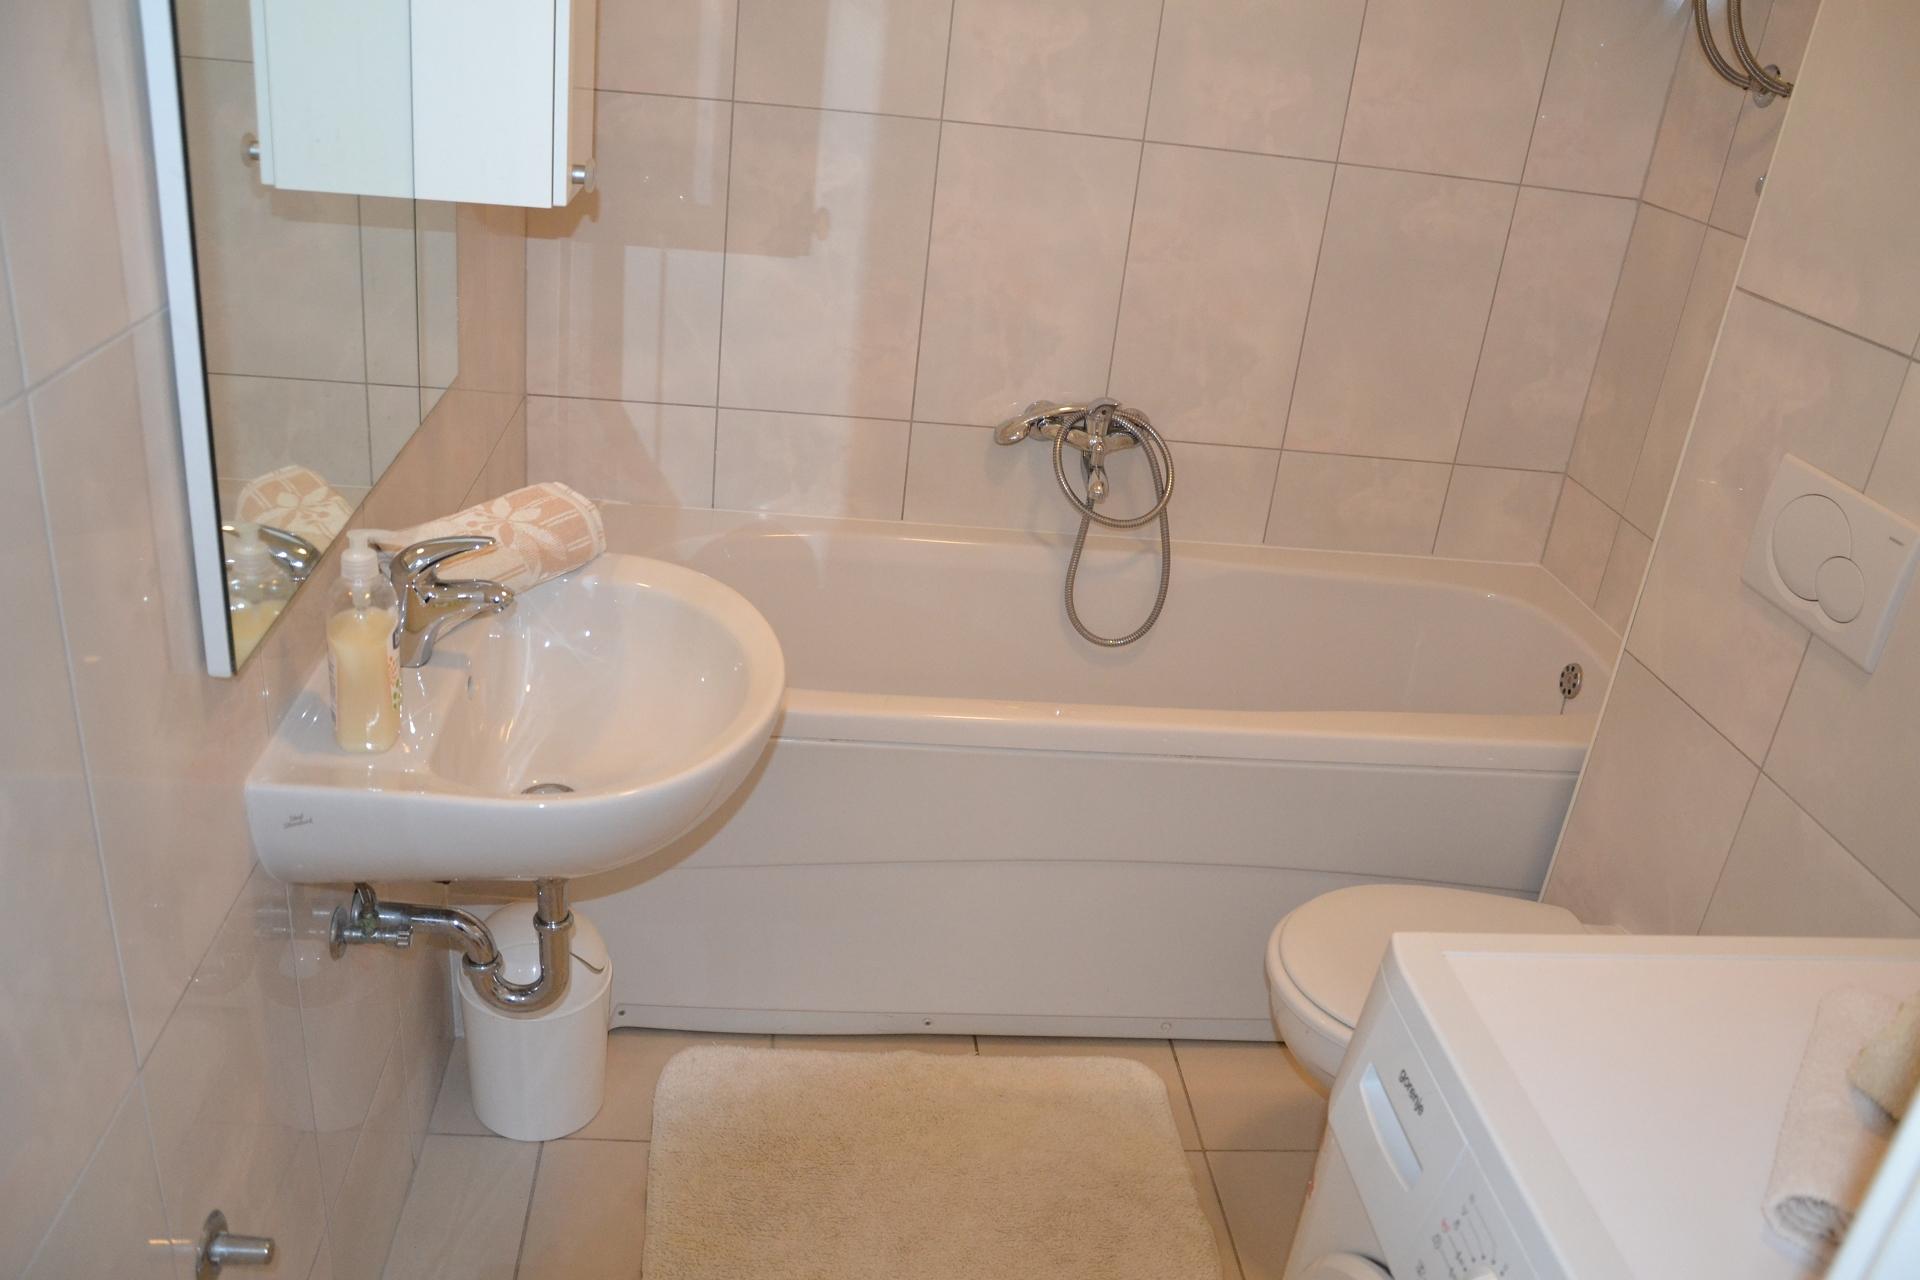 34989  - Trogir - Appartements Croatie - A3(4+2): salle de bain W-C